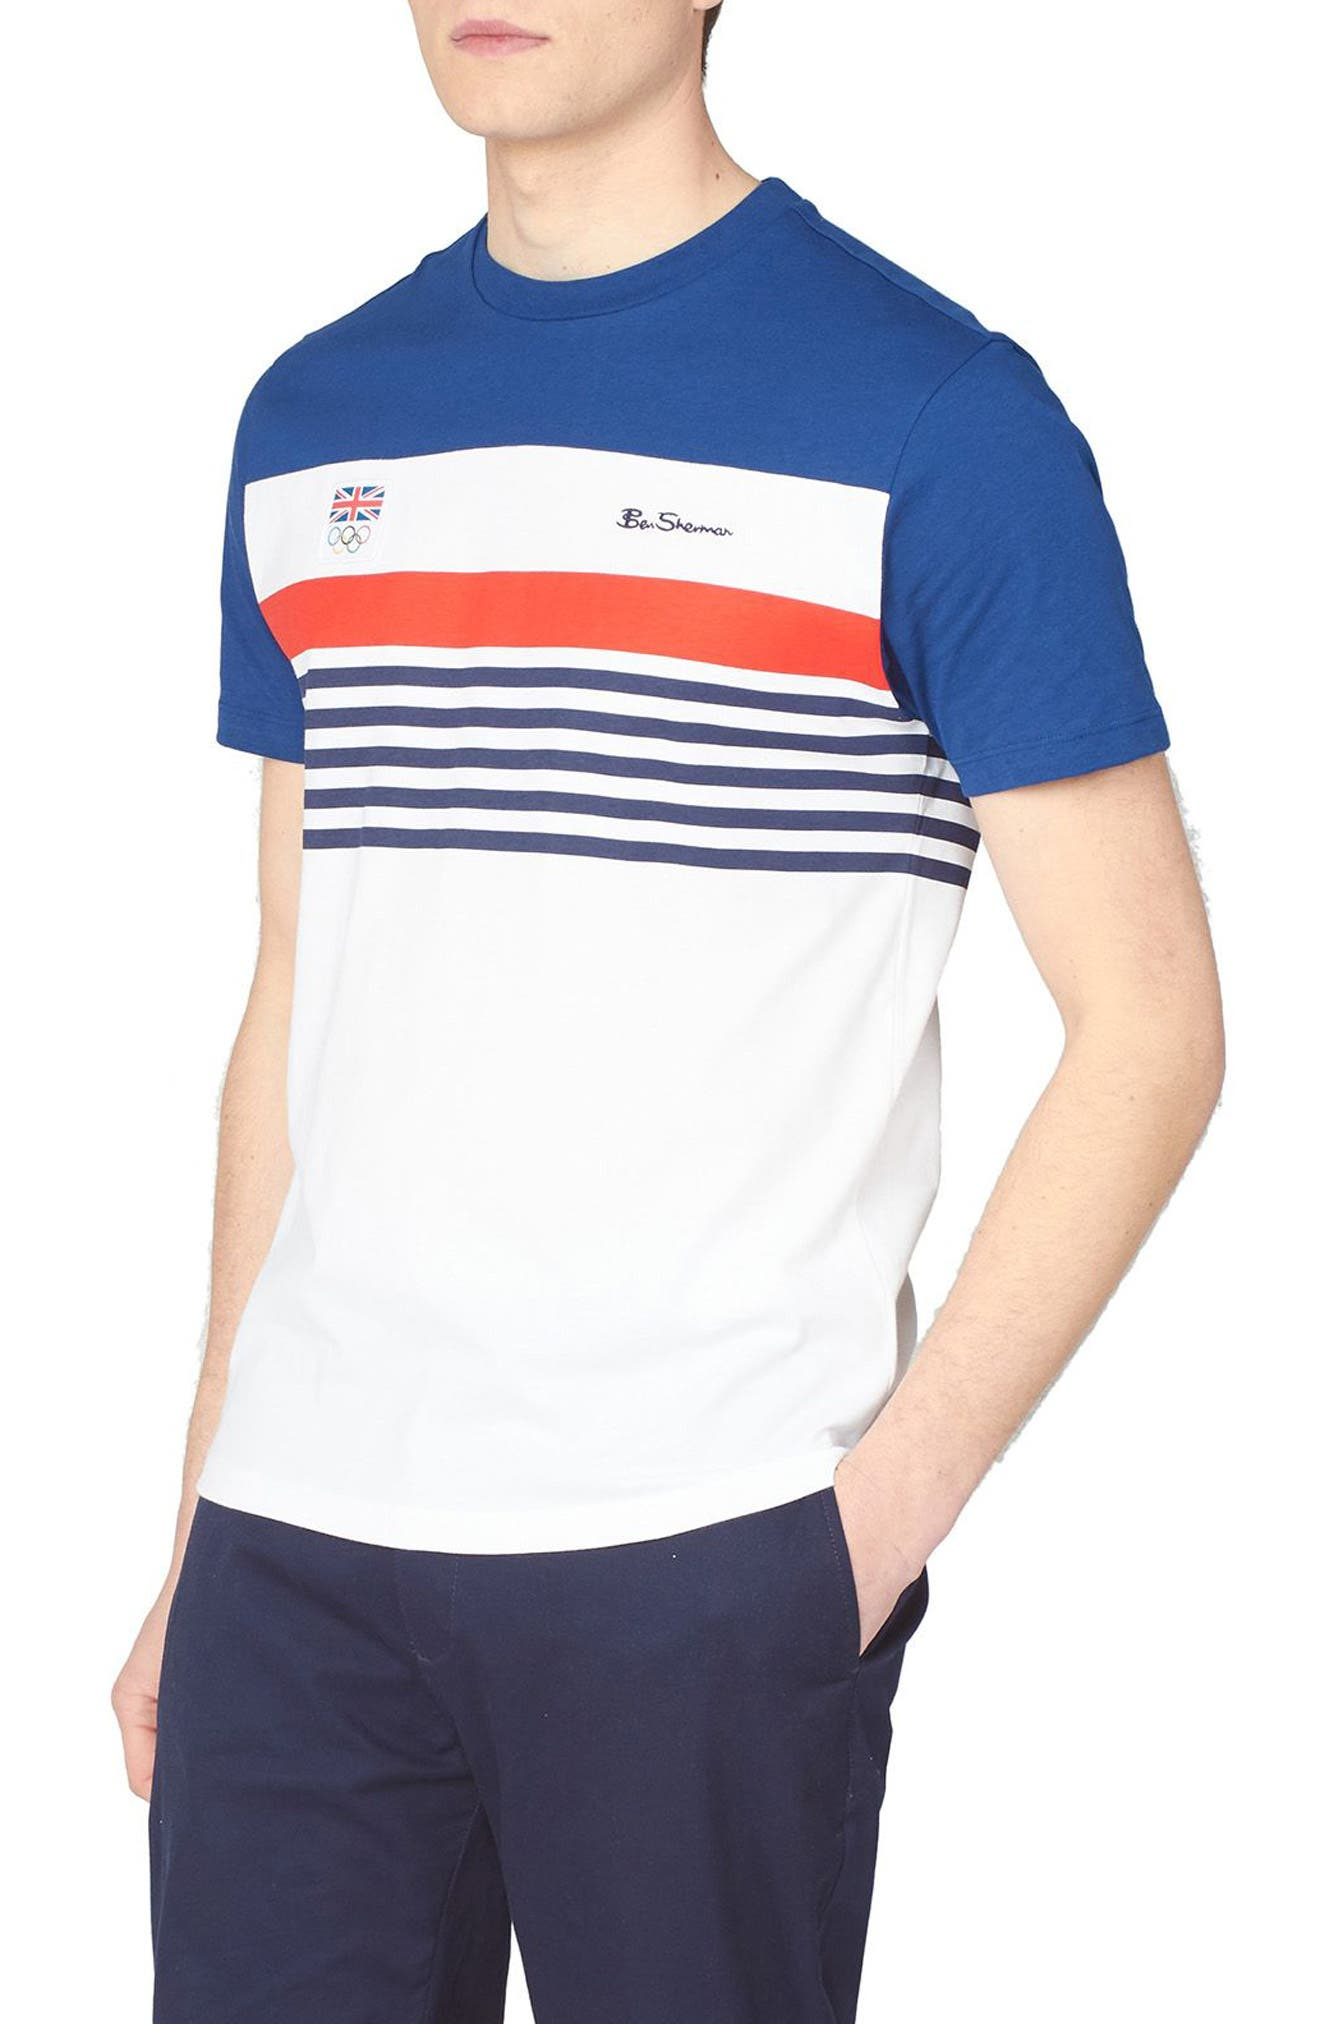 Team Gb Chest Stripe T-Shirt